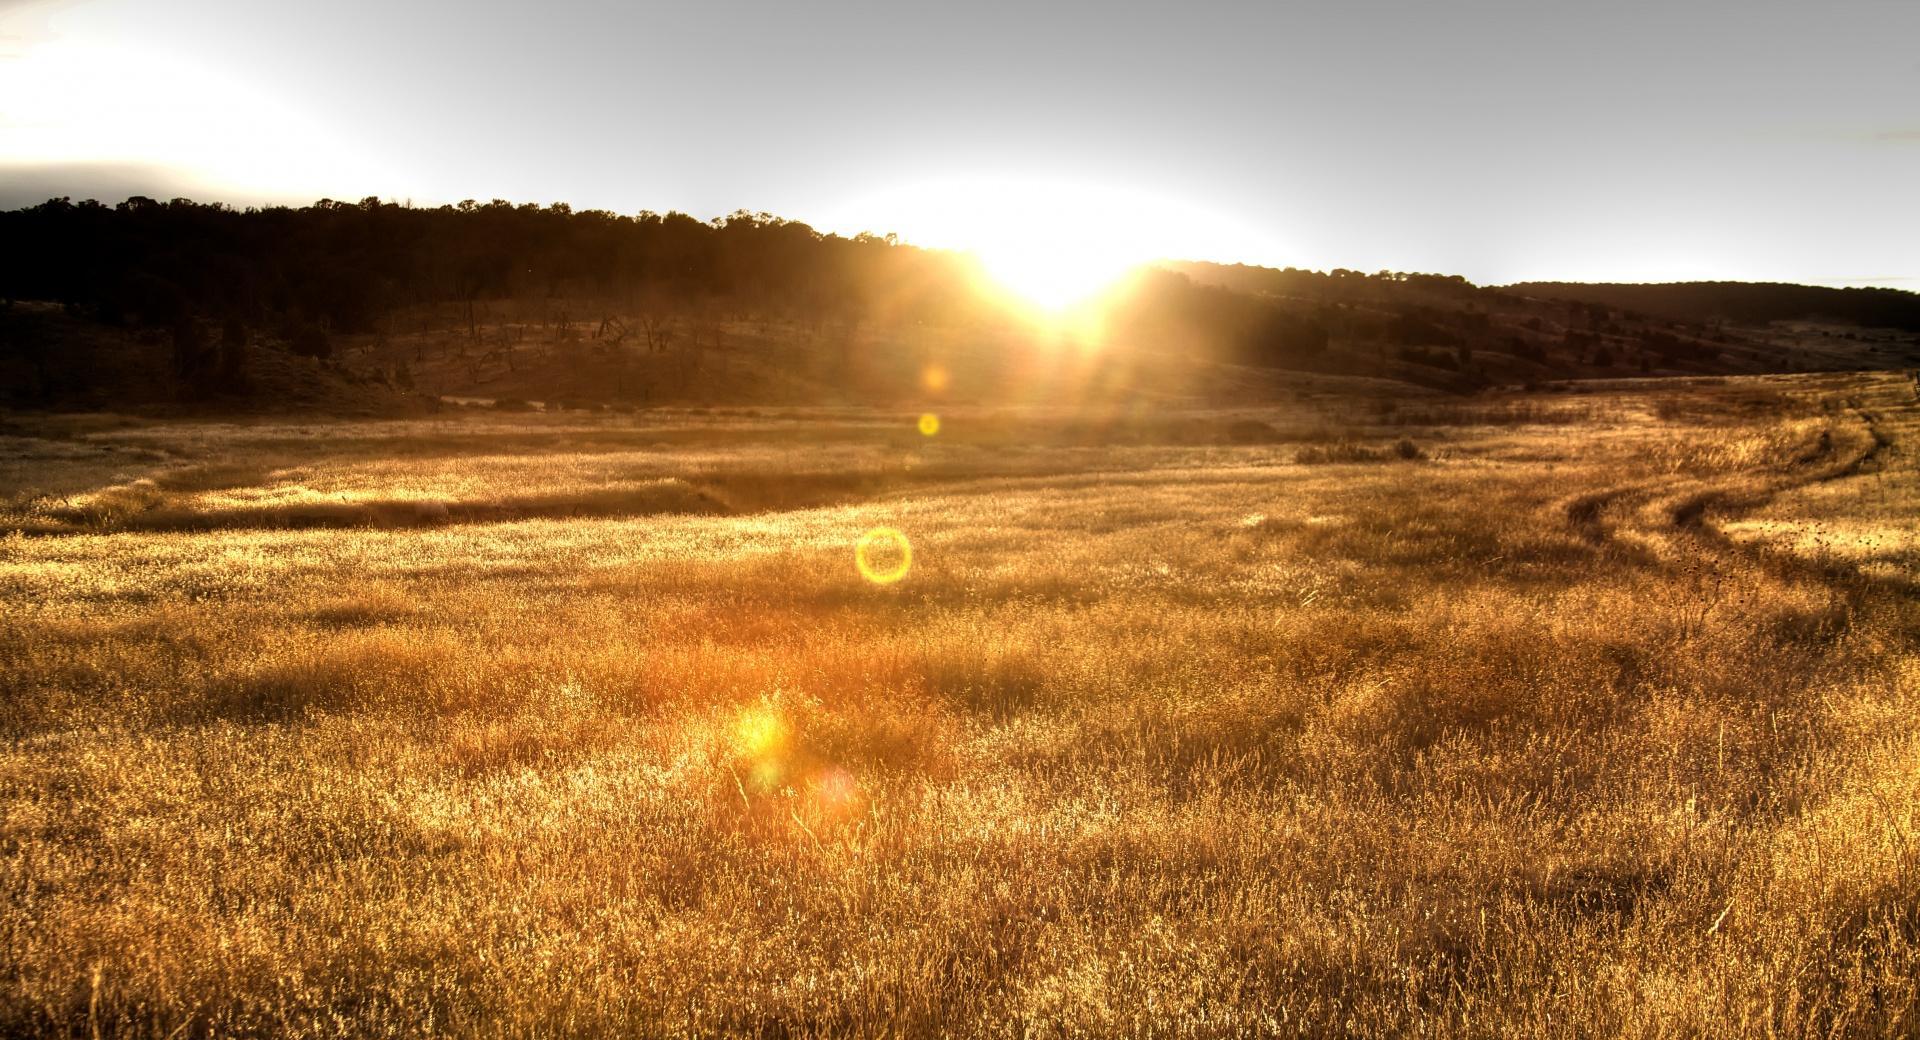 Sun Backlit Grain wallpapers HD quality